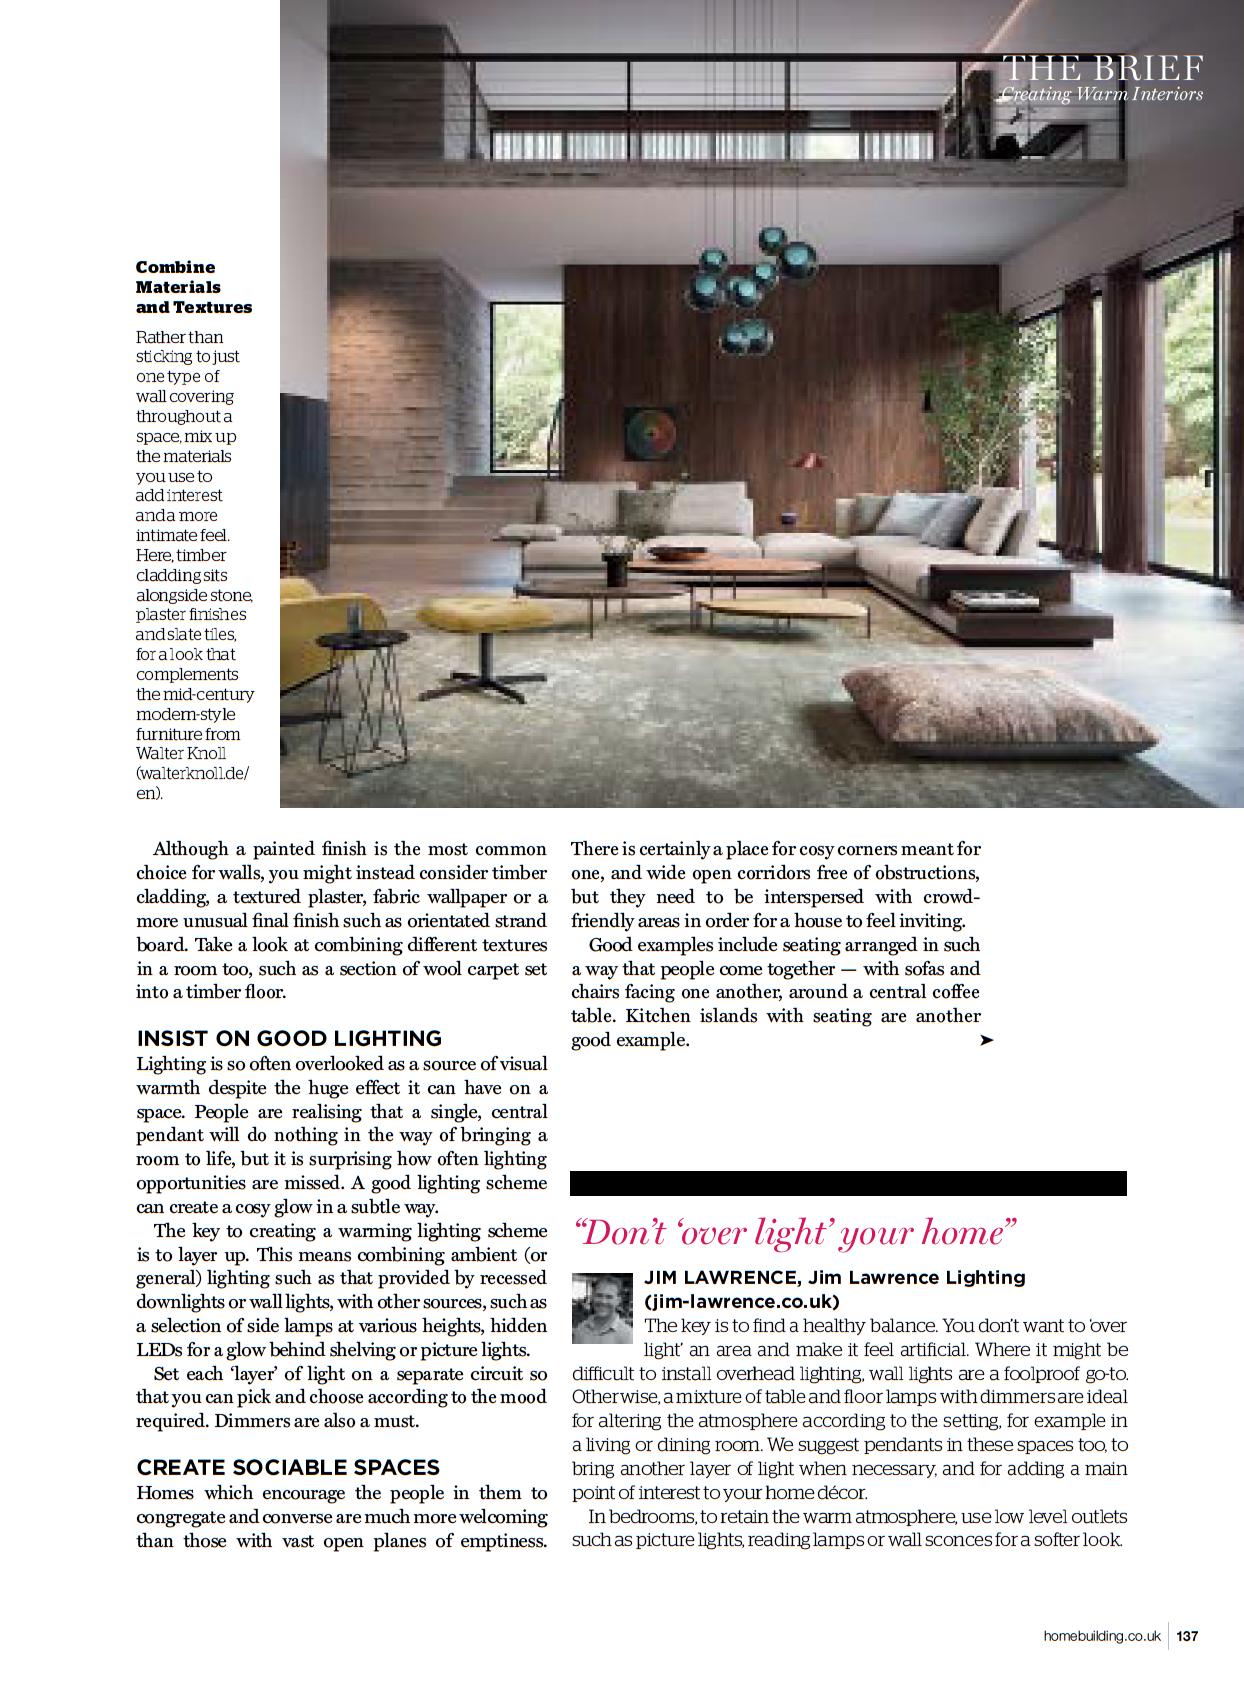 Homebuilding & Renovating featuring high end interior designer Jo Hamilton November 2018 3